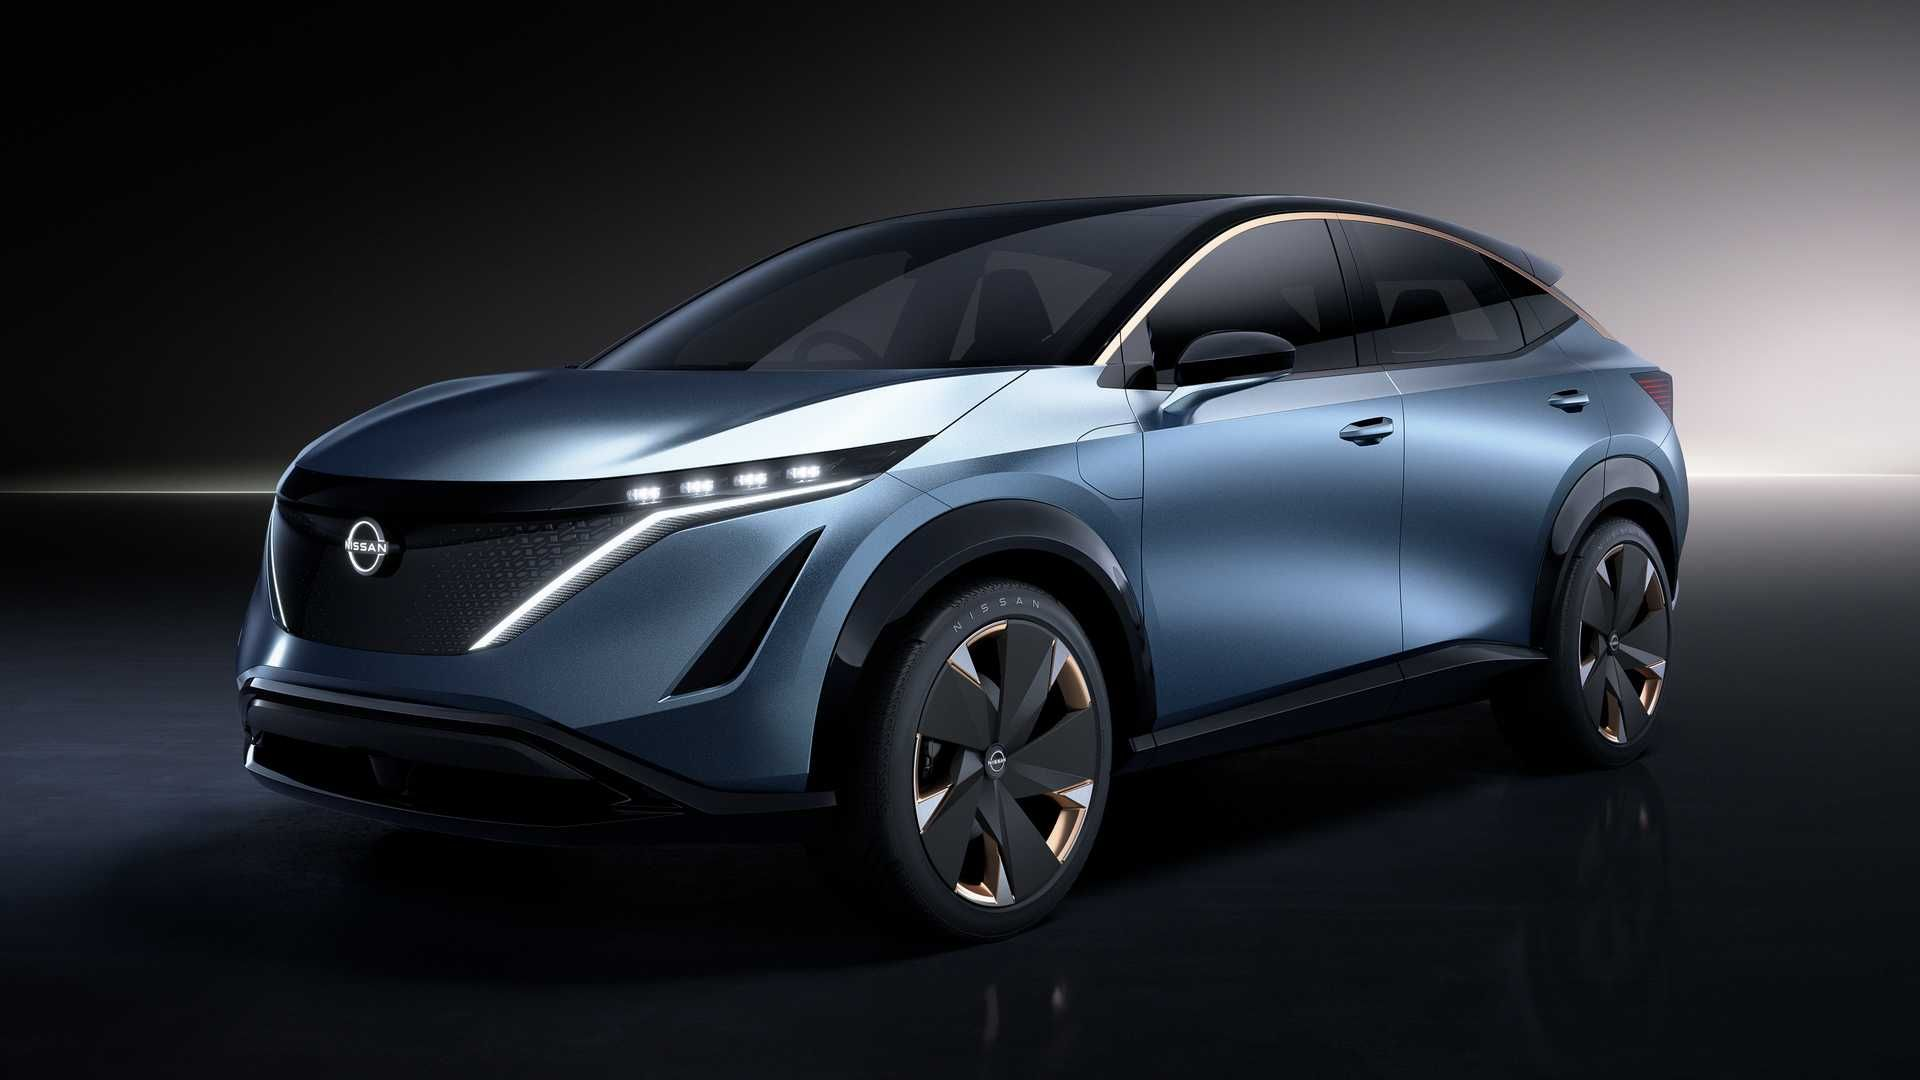 creación de automóviles realizada 2020 impot 2020